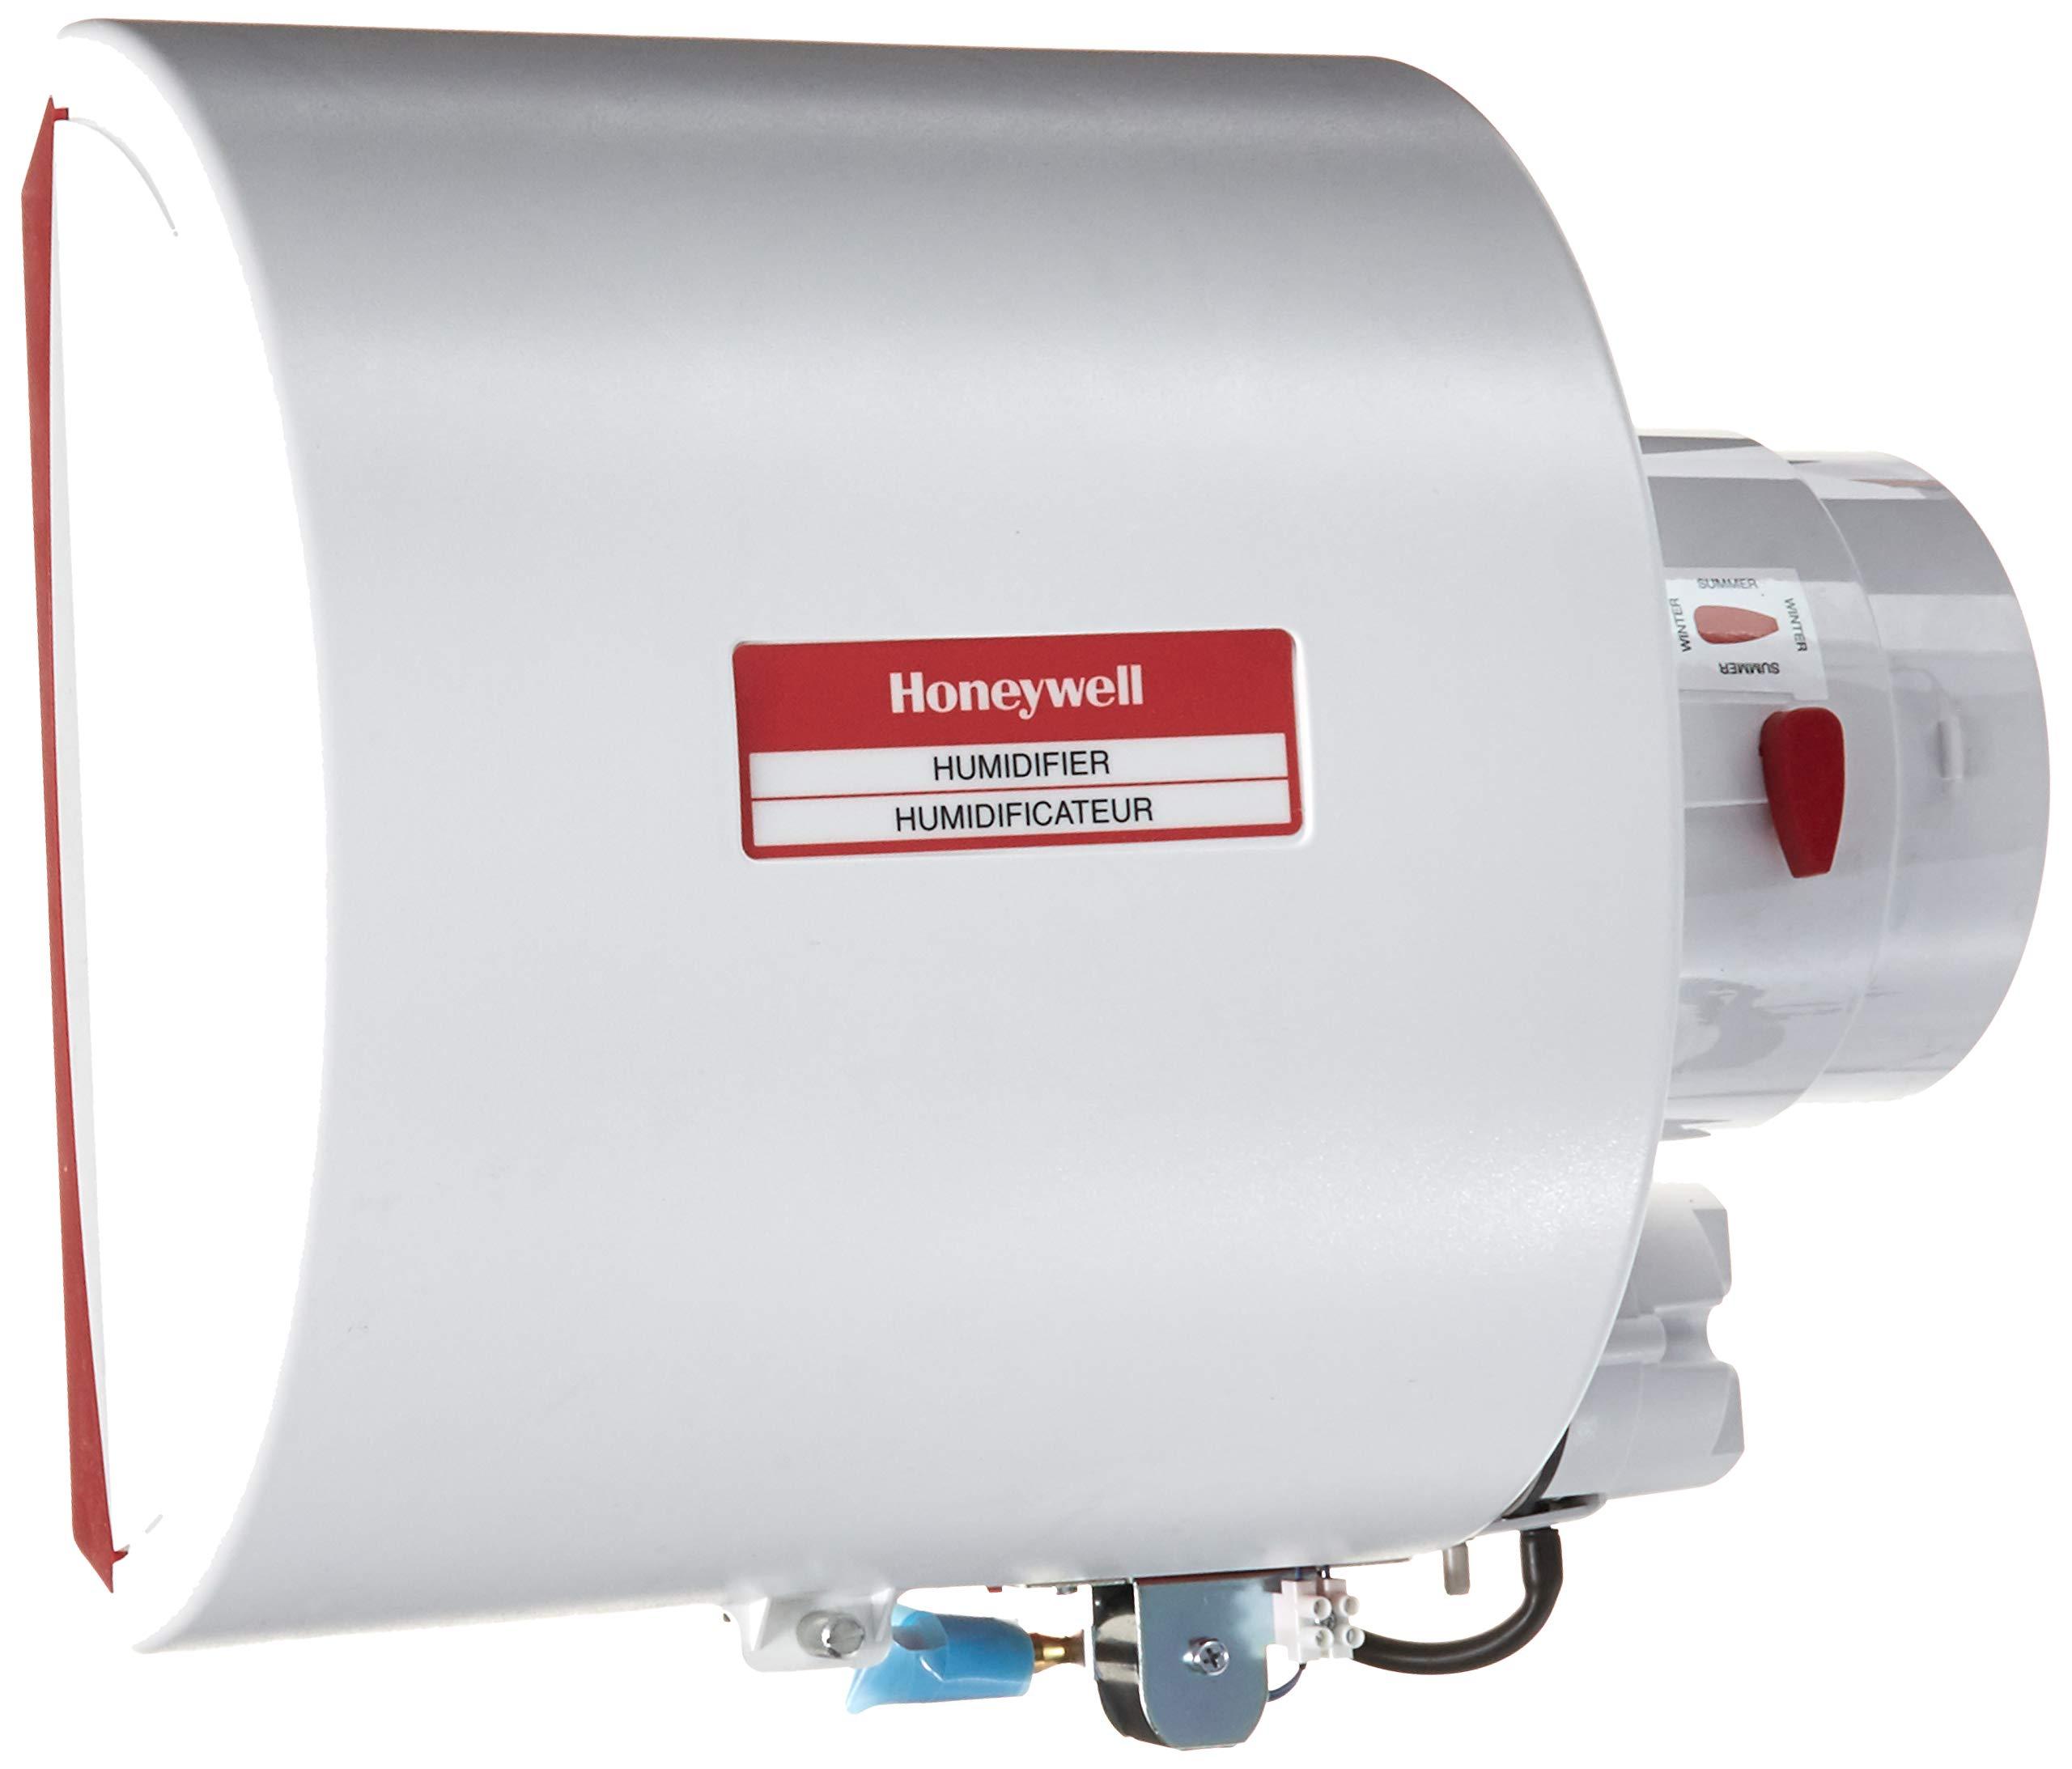 Honeywell HE240A2001 HE240A Whole House Humidifier by Honeywell